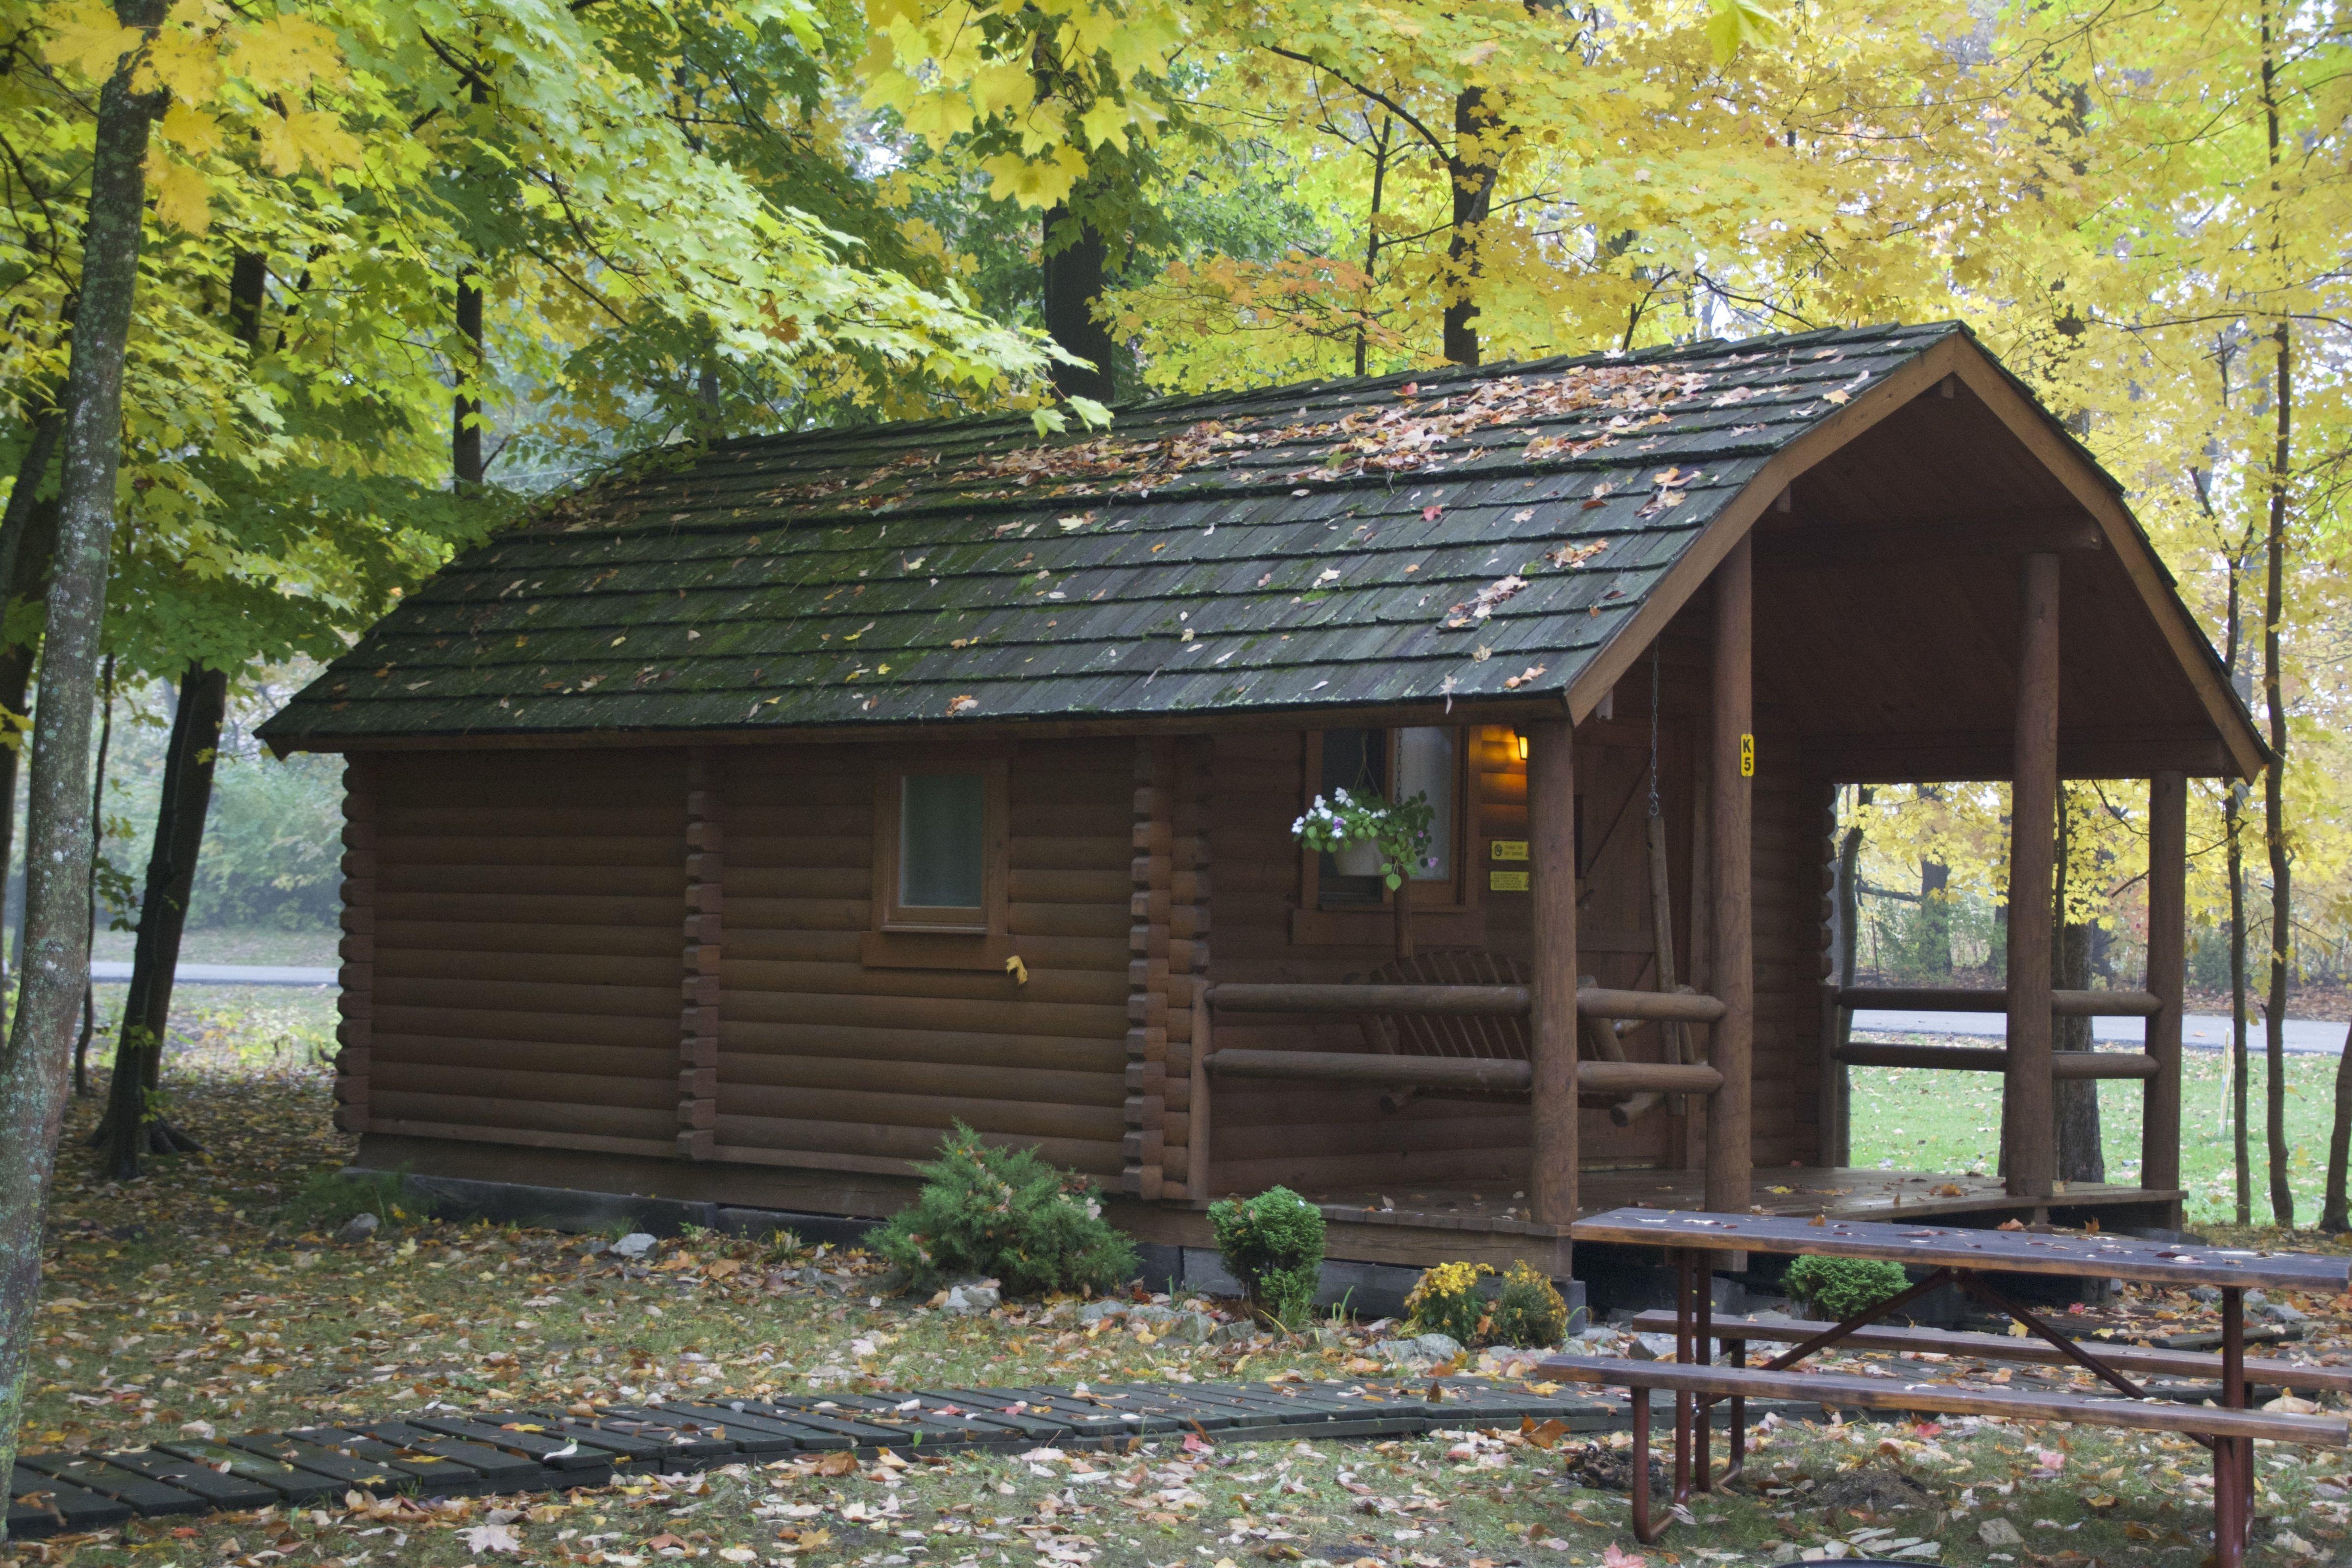 Terre Haute Koa Camping Photo Koa Pet Friendly Cabins